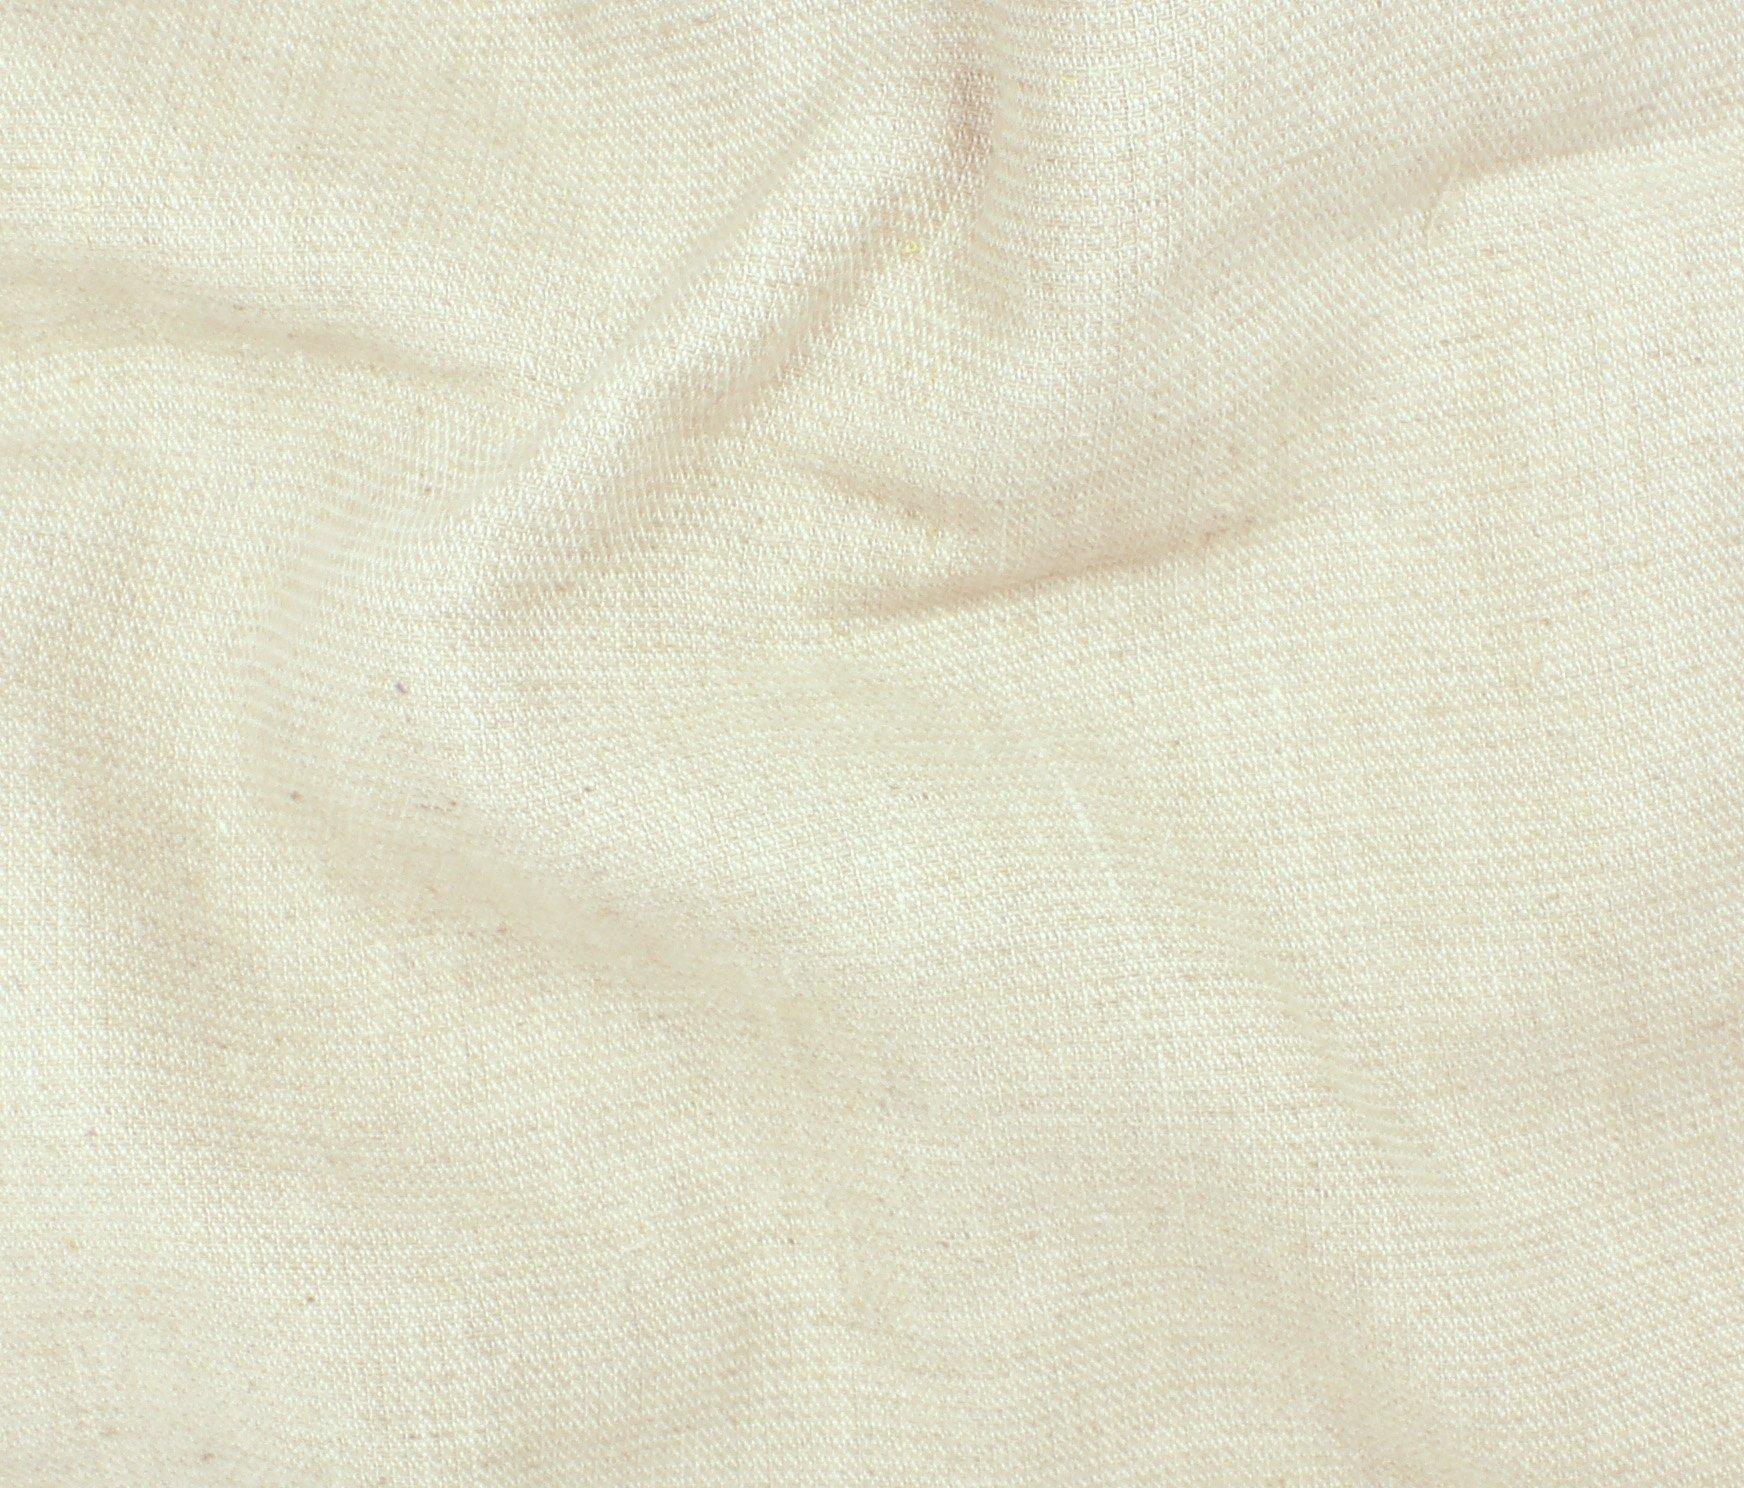 Basketweave Hemp Canvas - Oatmeal